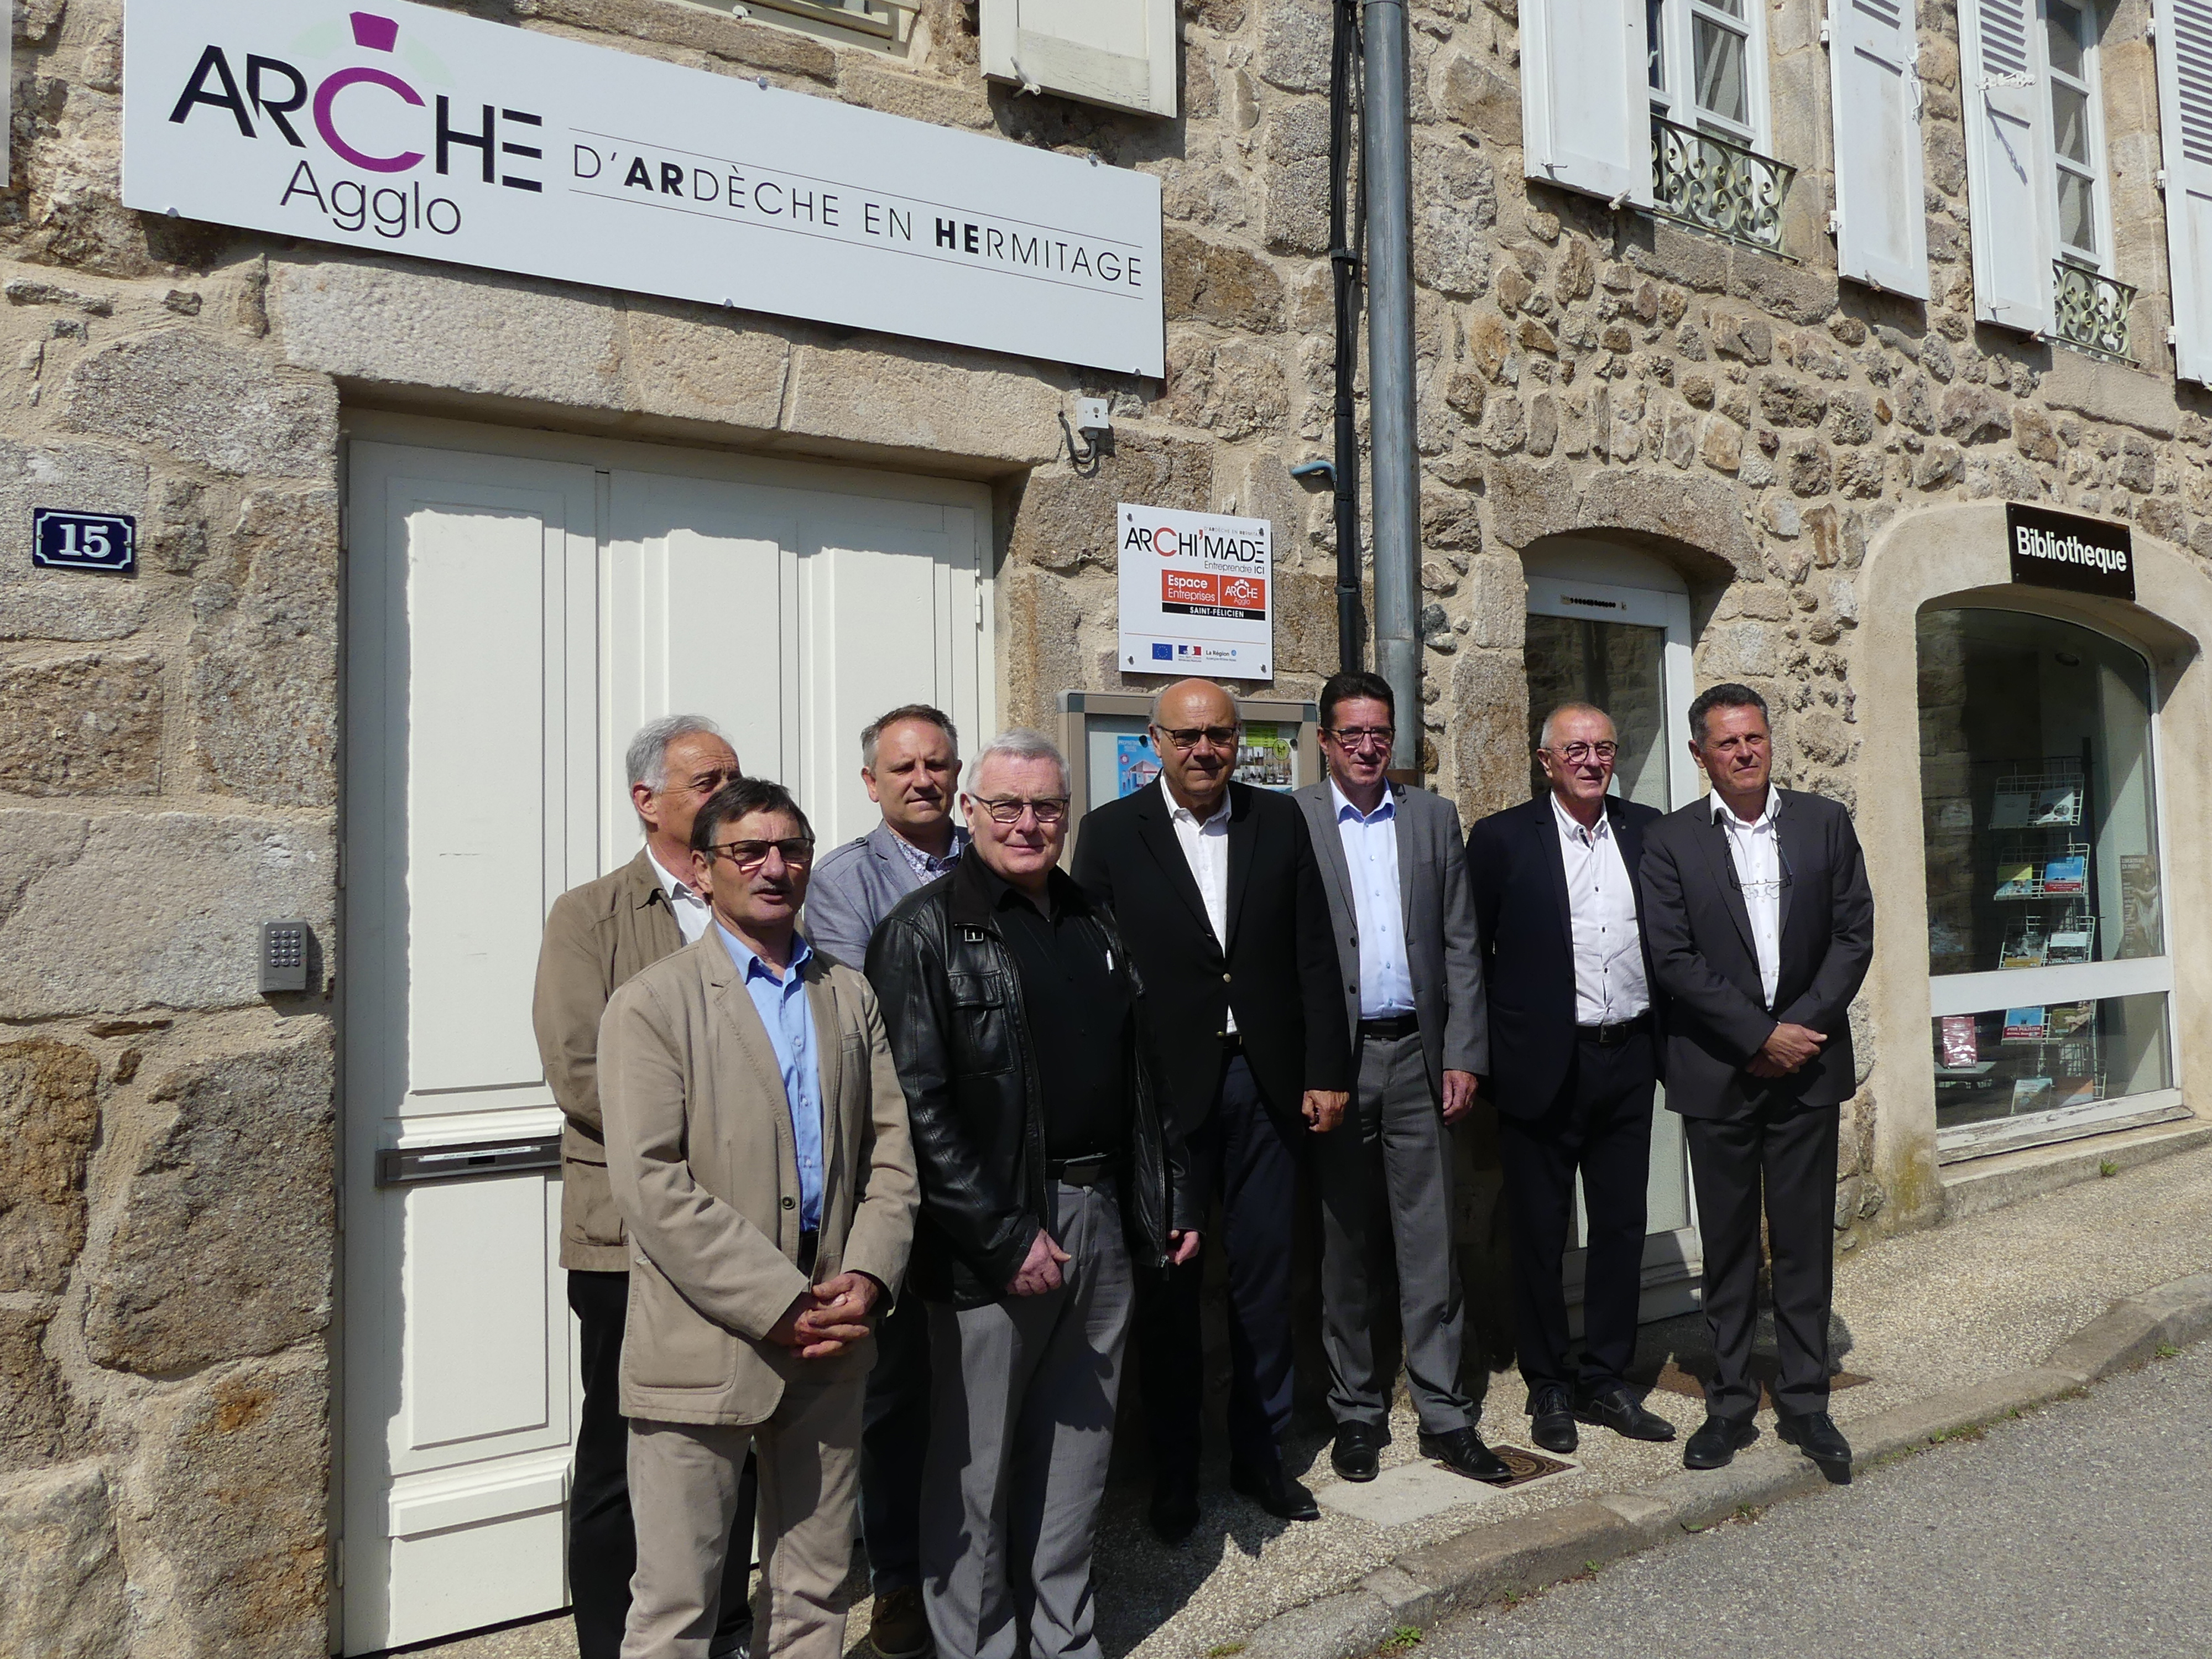 archimade-lancement-marque eco ARCHE Agglo.JPG